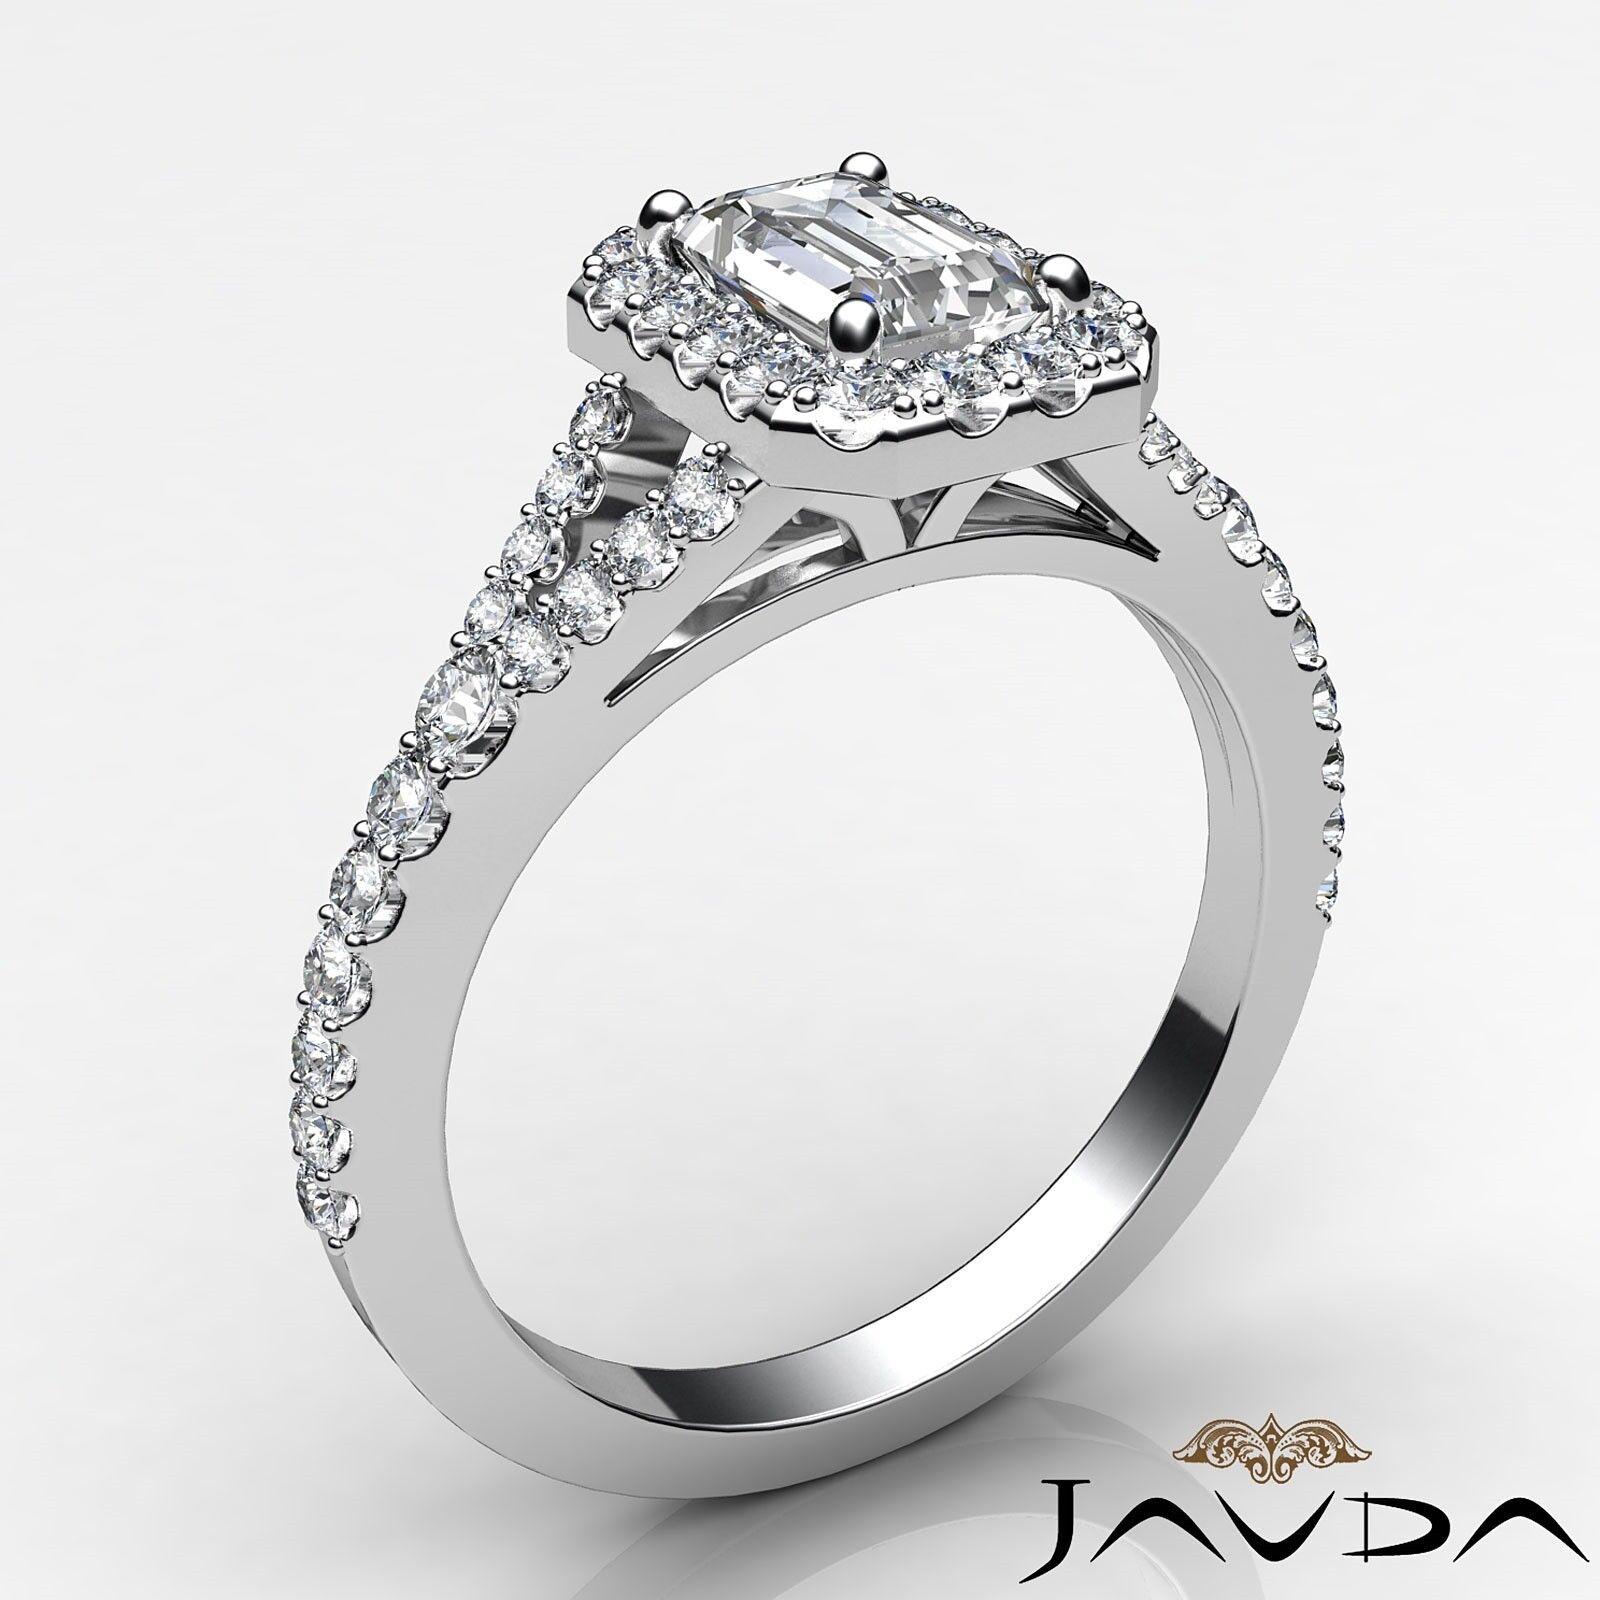 1.23ctw Halo U Pave Stone Emerald Diamond Engagement Ring GIA H-SI1 White Gold 1